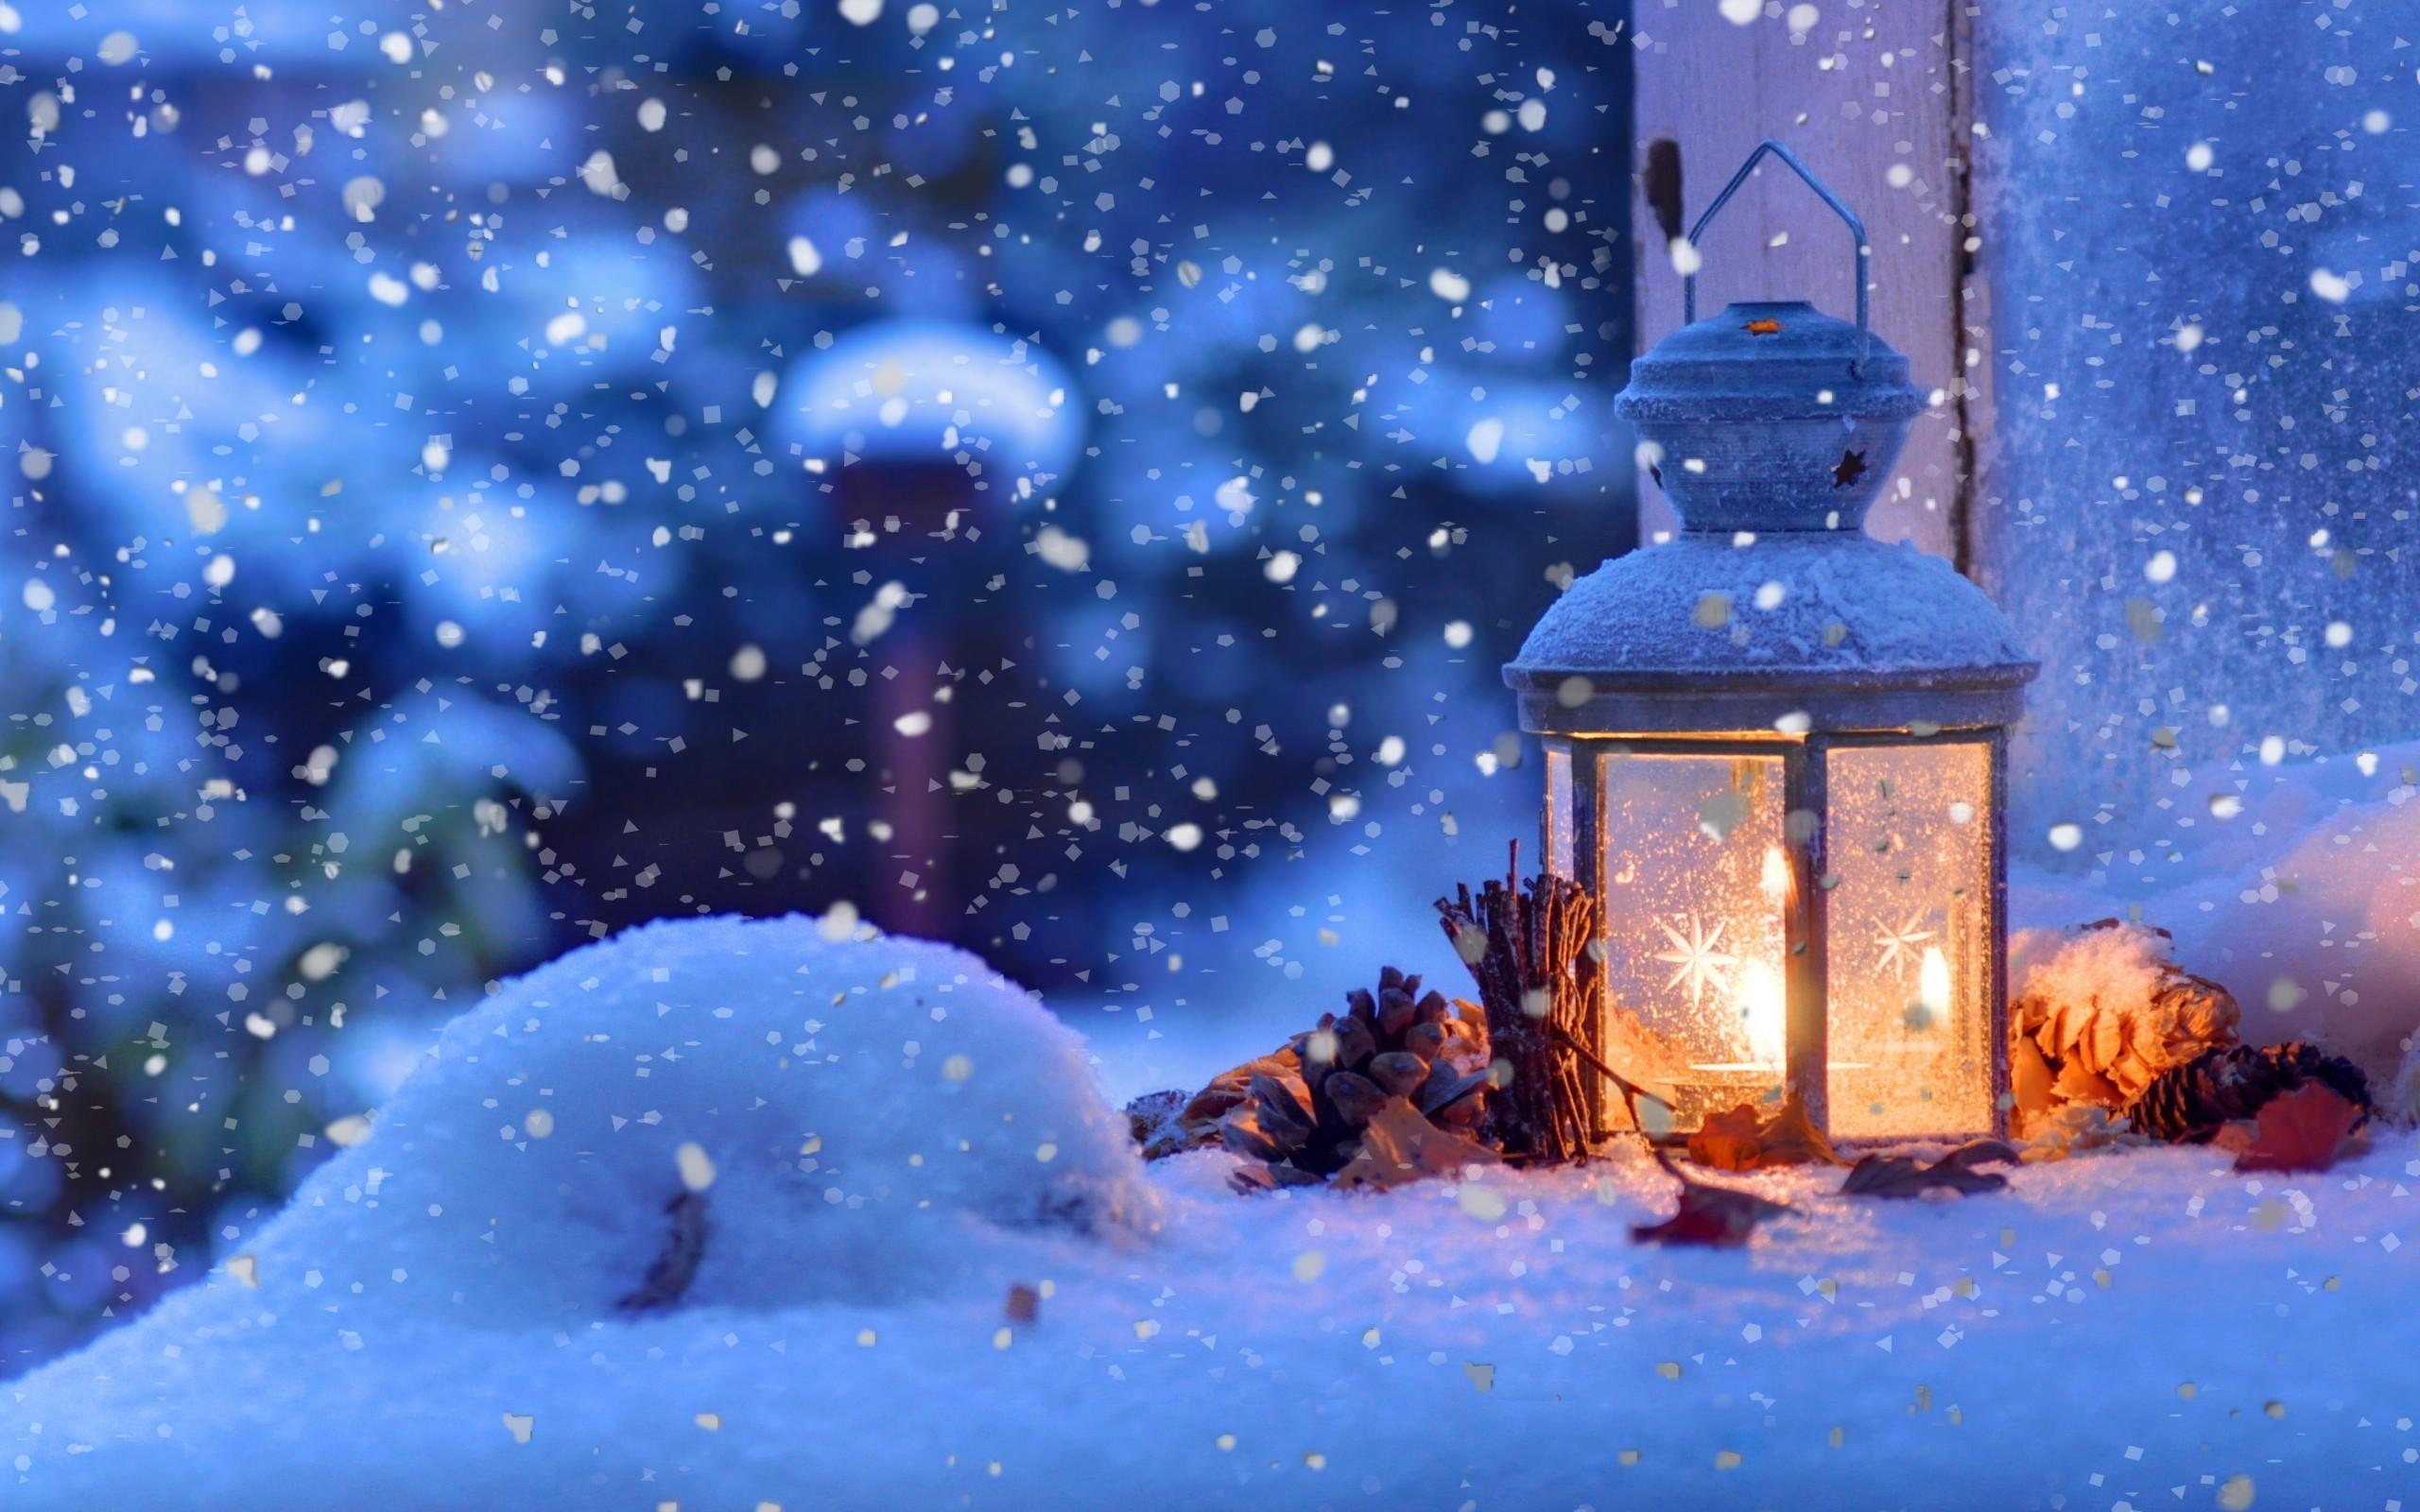 Christmas mood 4K Ultra HD wallpaper   4k-Wallpaper.Net